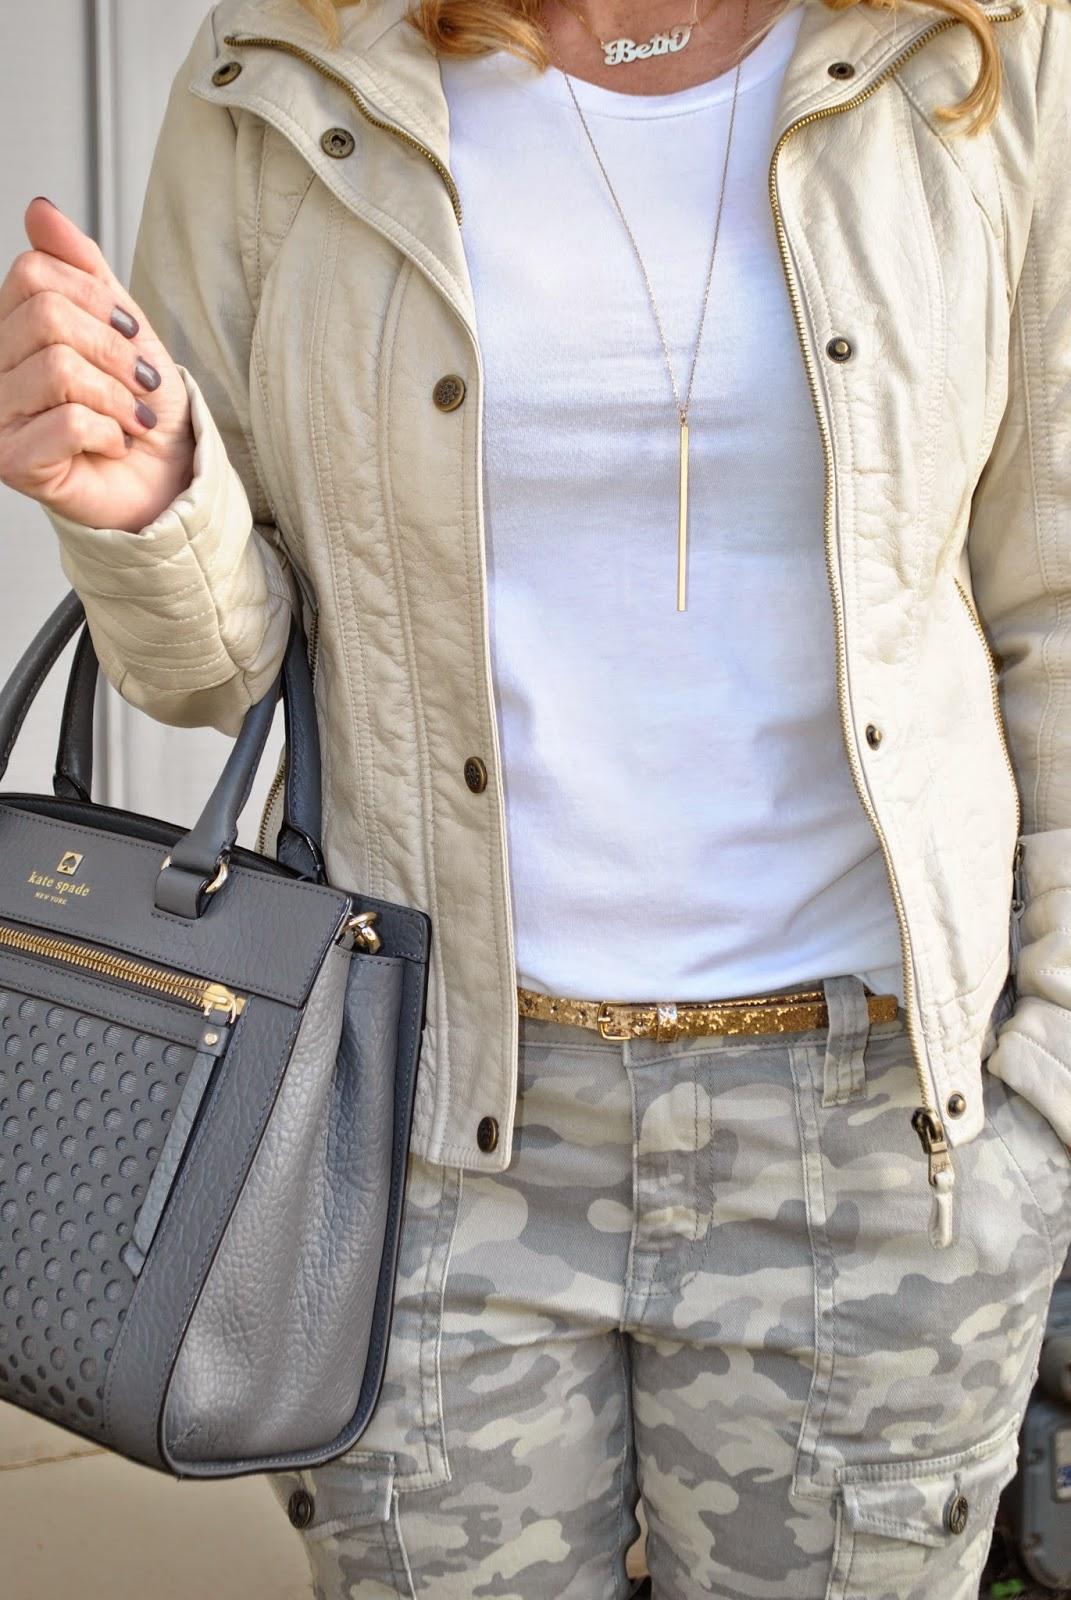 J Crew Sunglasses, Gap Camo Pants, Neutral Prints, Kate Spade Perri Satchel Sunshine and Sequins Fashion Blog